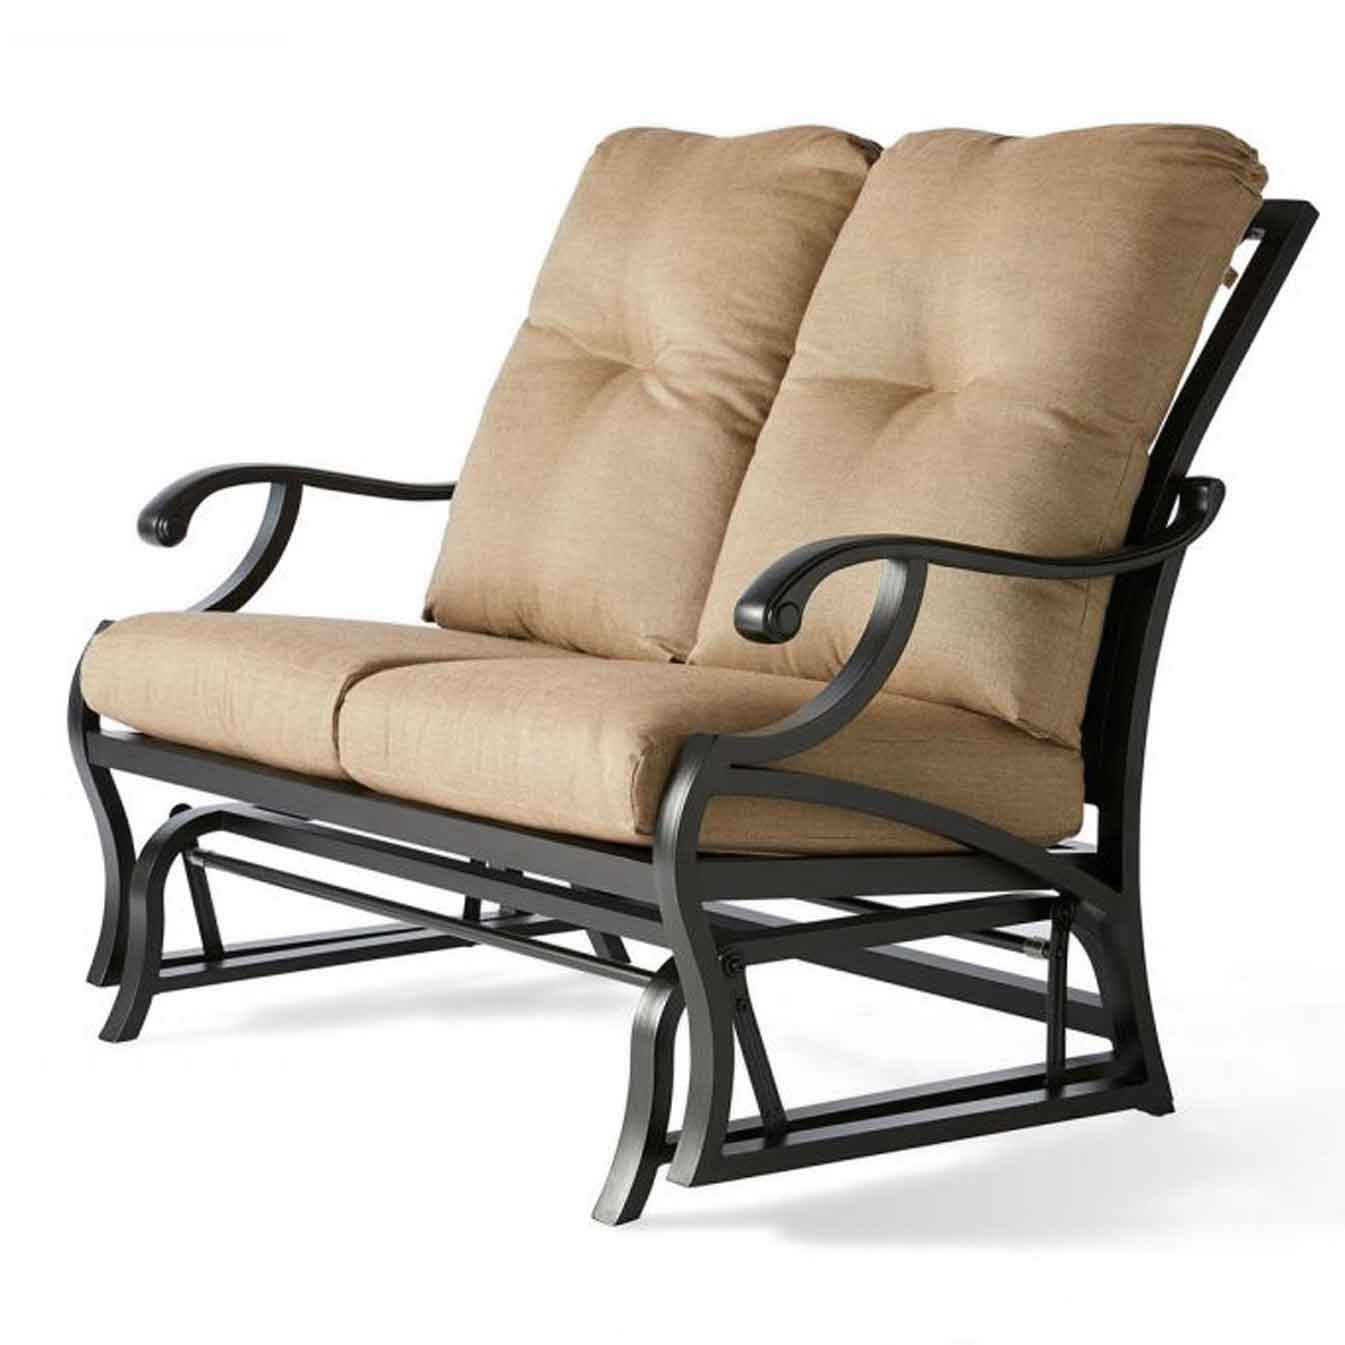 Volare Cushion Double Glider - Fife Bark